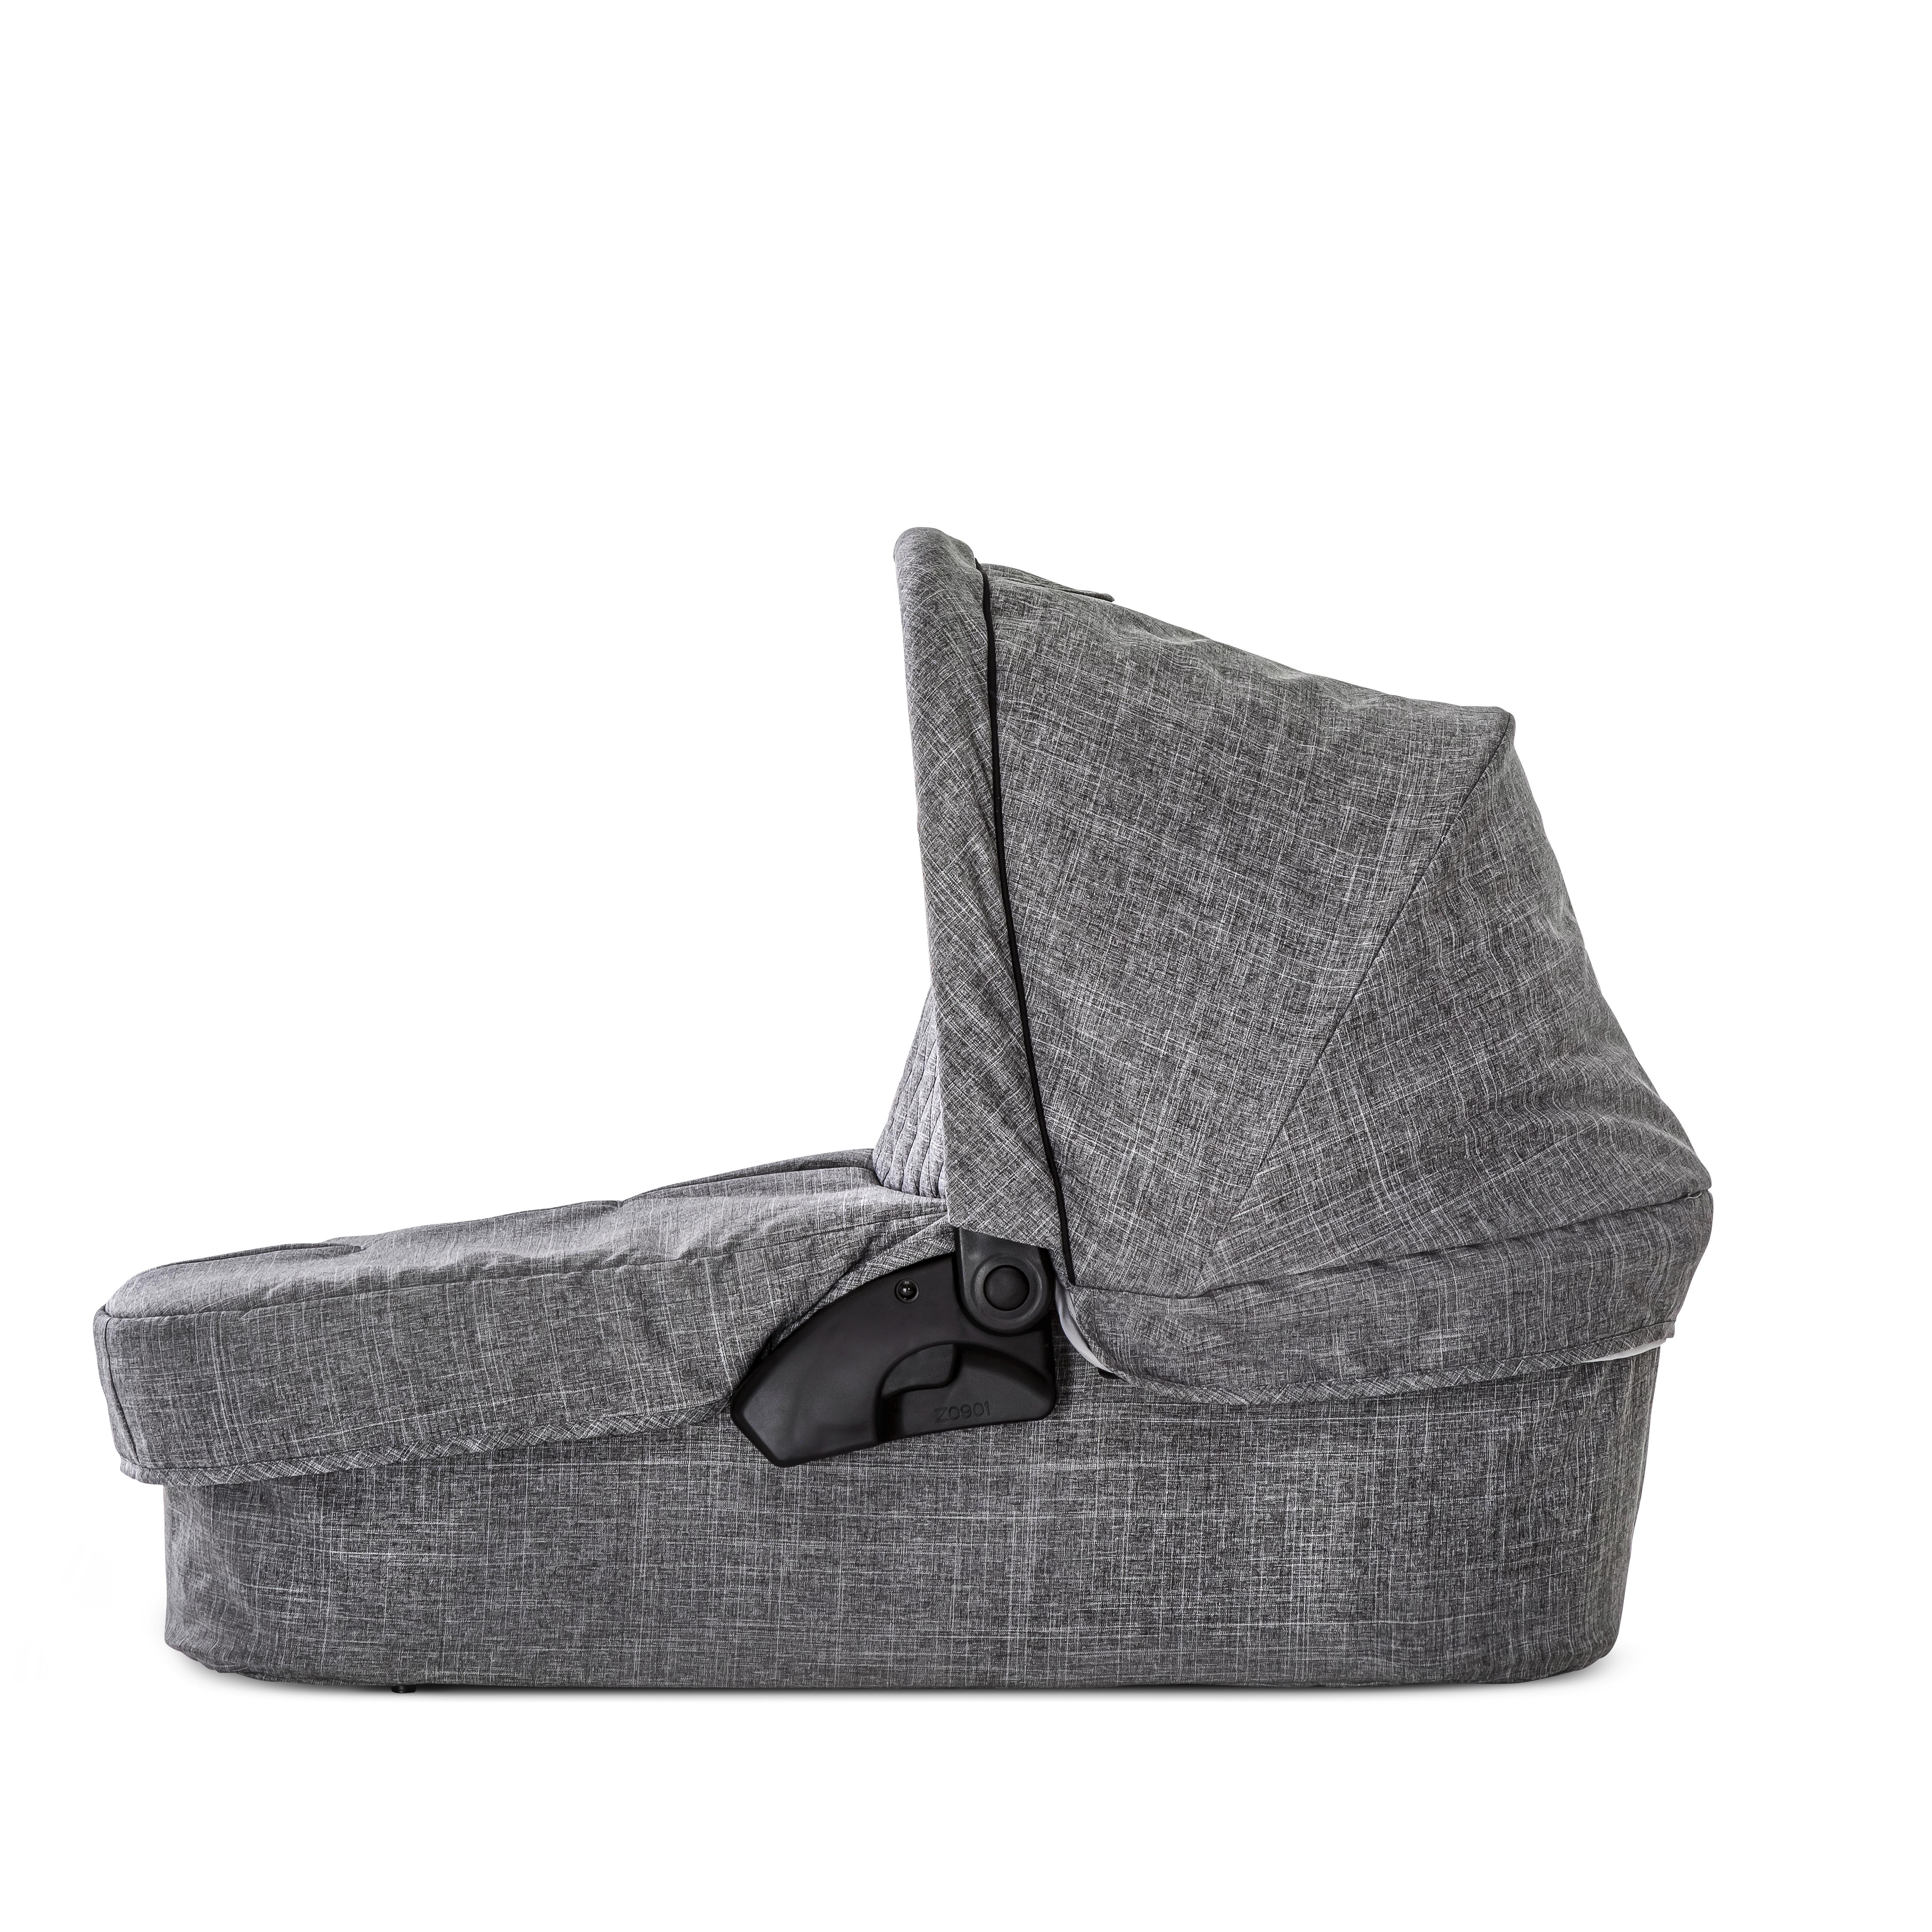 DEČJA KOLICA - SET - Crna/Siva, Konvencionalno, Tekstil/Metal (101/94/55cm) - Hauck